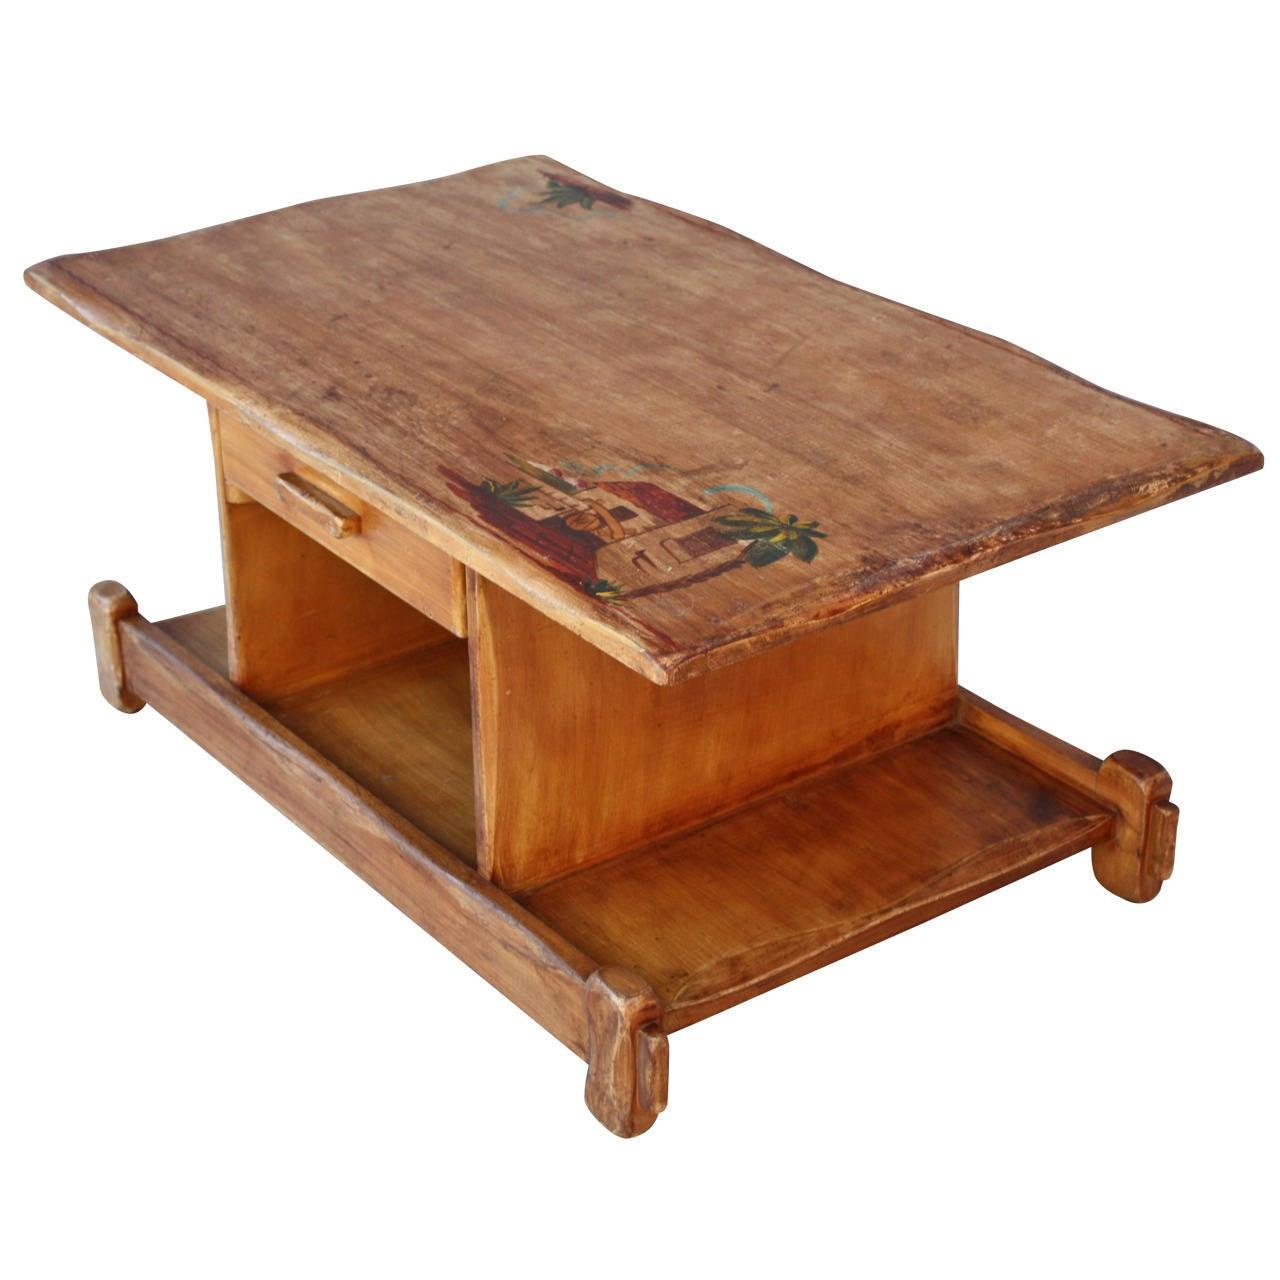 Very Unusual Rancho Coffee Table At 1stdibs